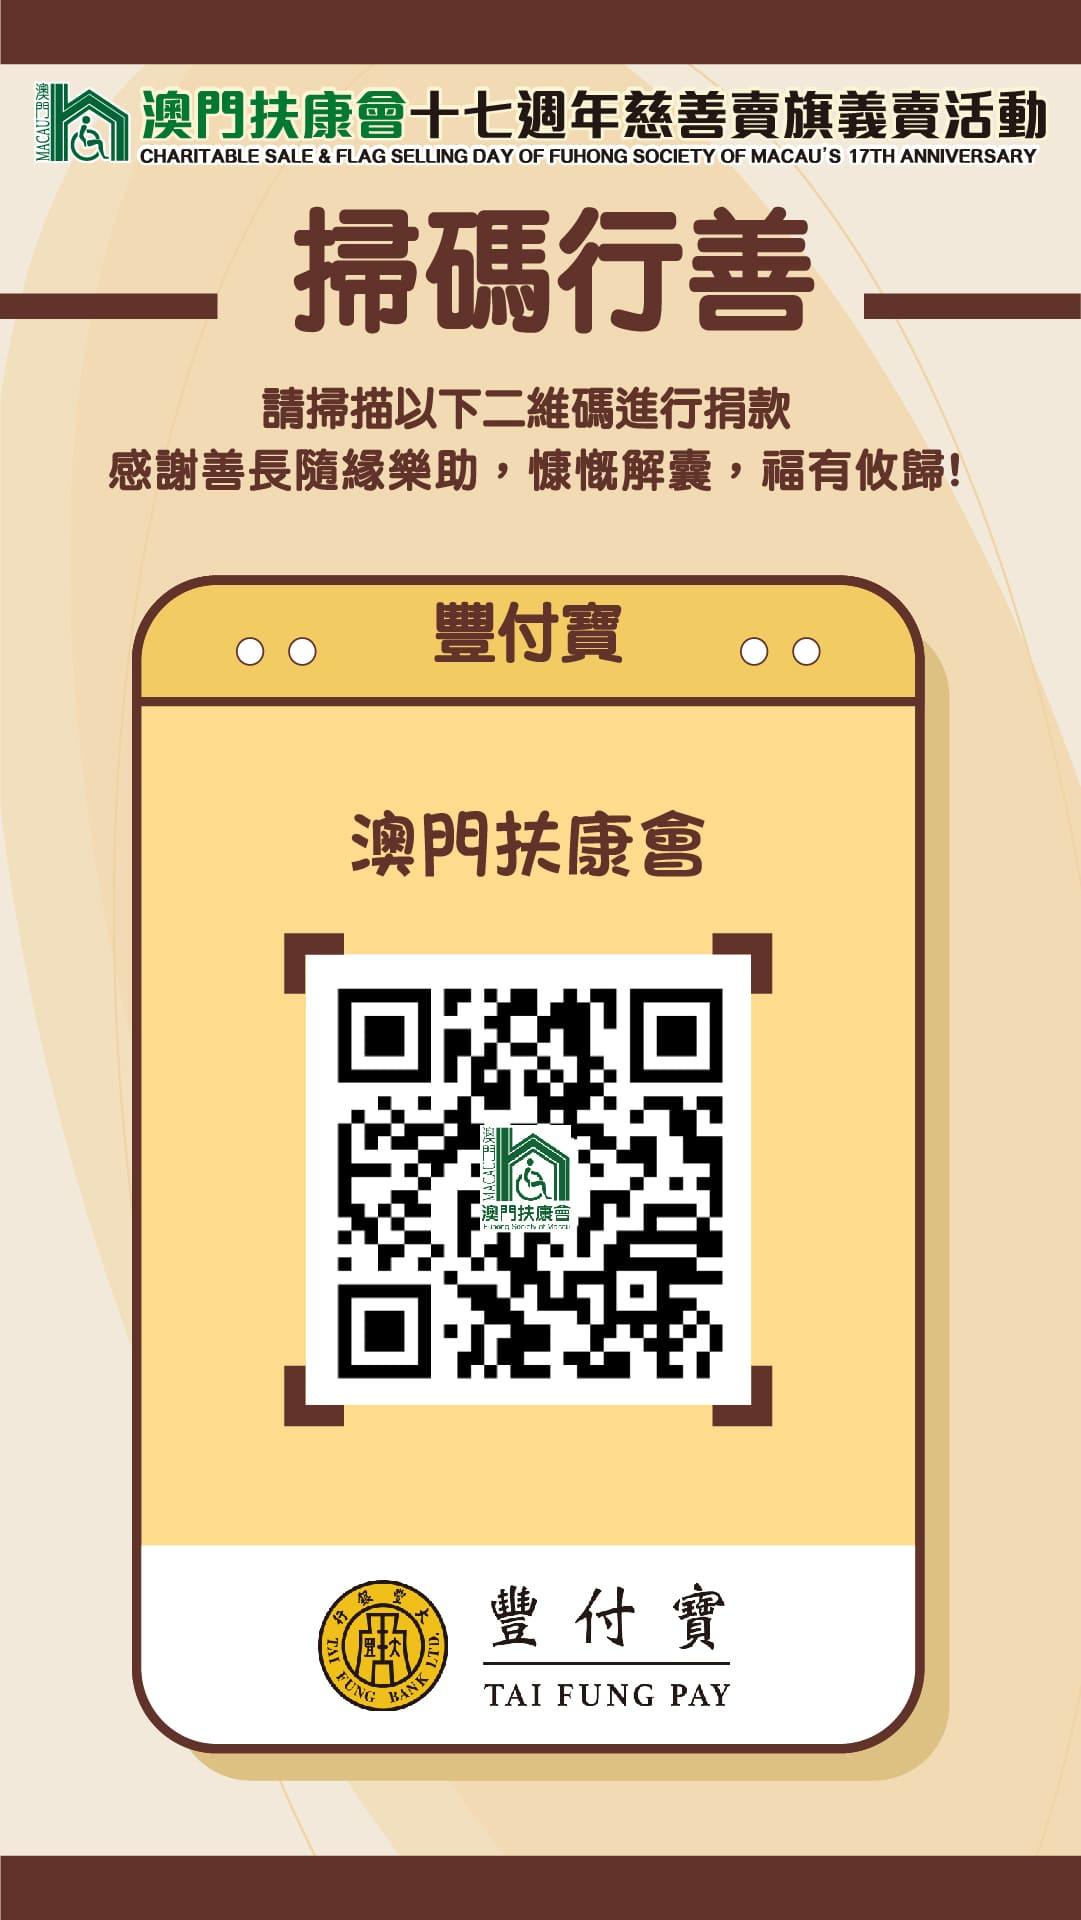 4.掃碼行善捐款QRCODE-TAIFUNG.jpg